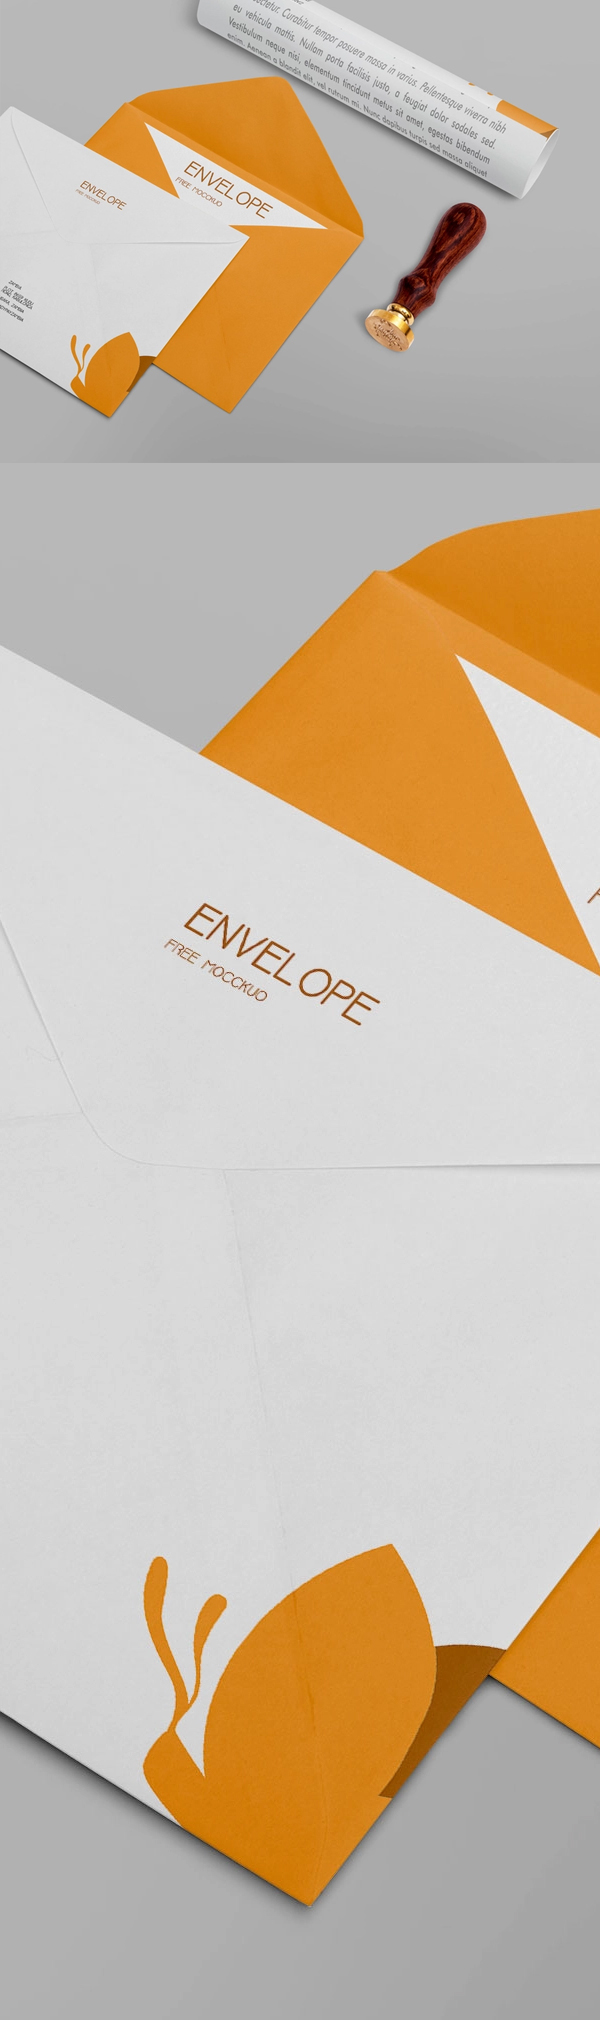 Free Company Envelope Design Mockup